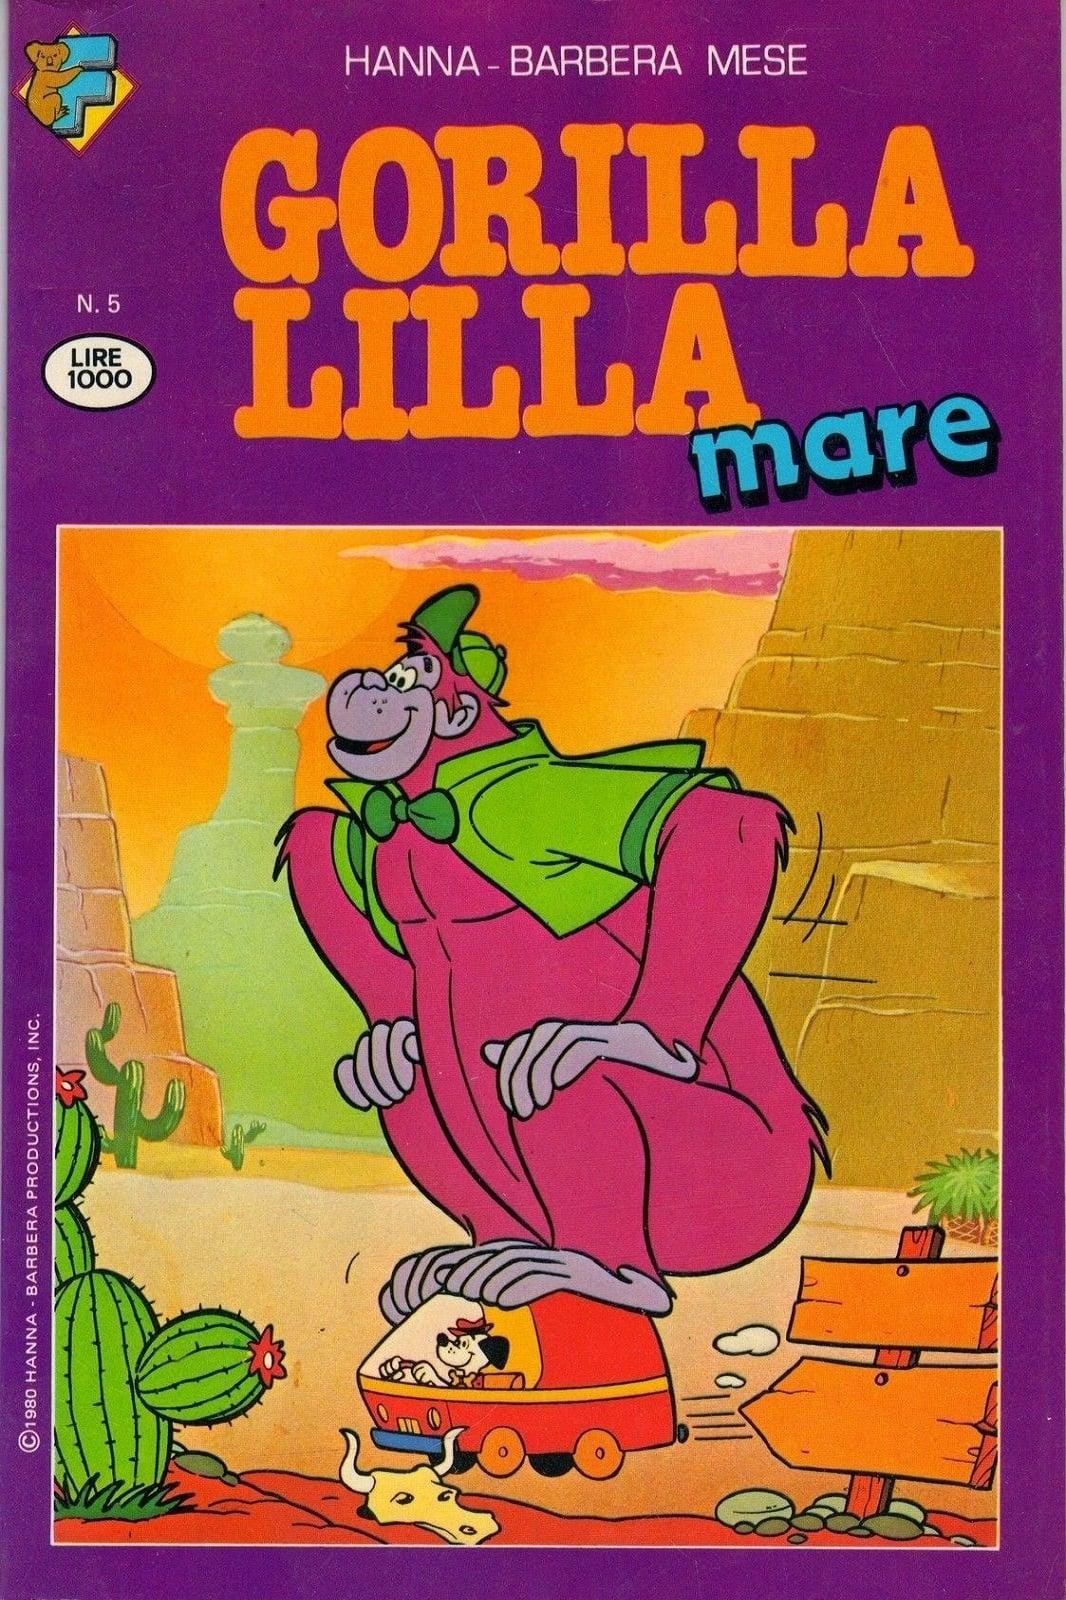 The Great Grape Ape Show